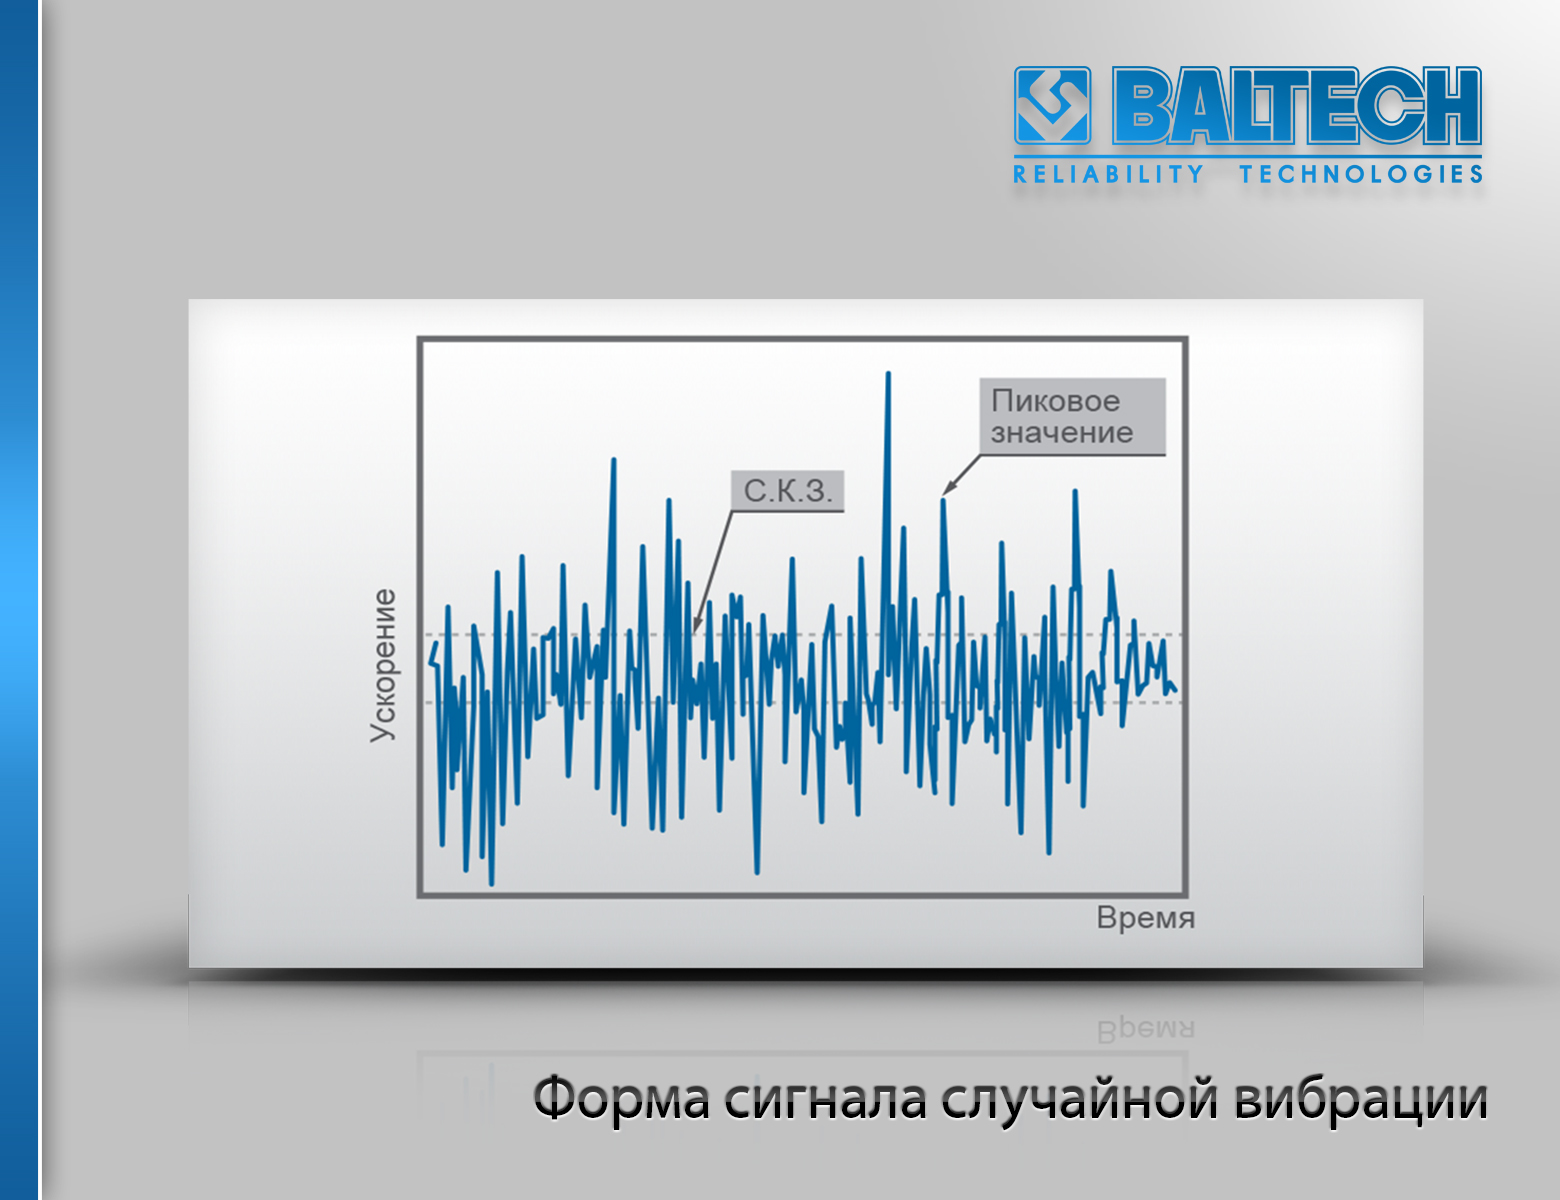 Форма сигнала случайной вибрации, анализ вибрации, вибродиагностика